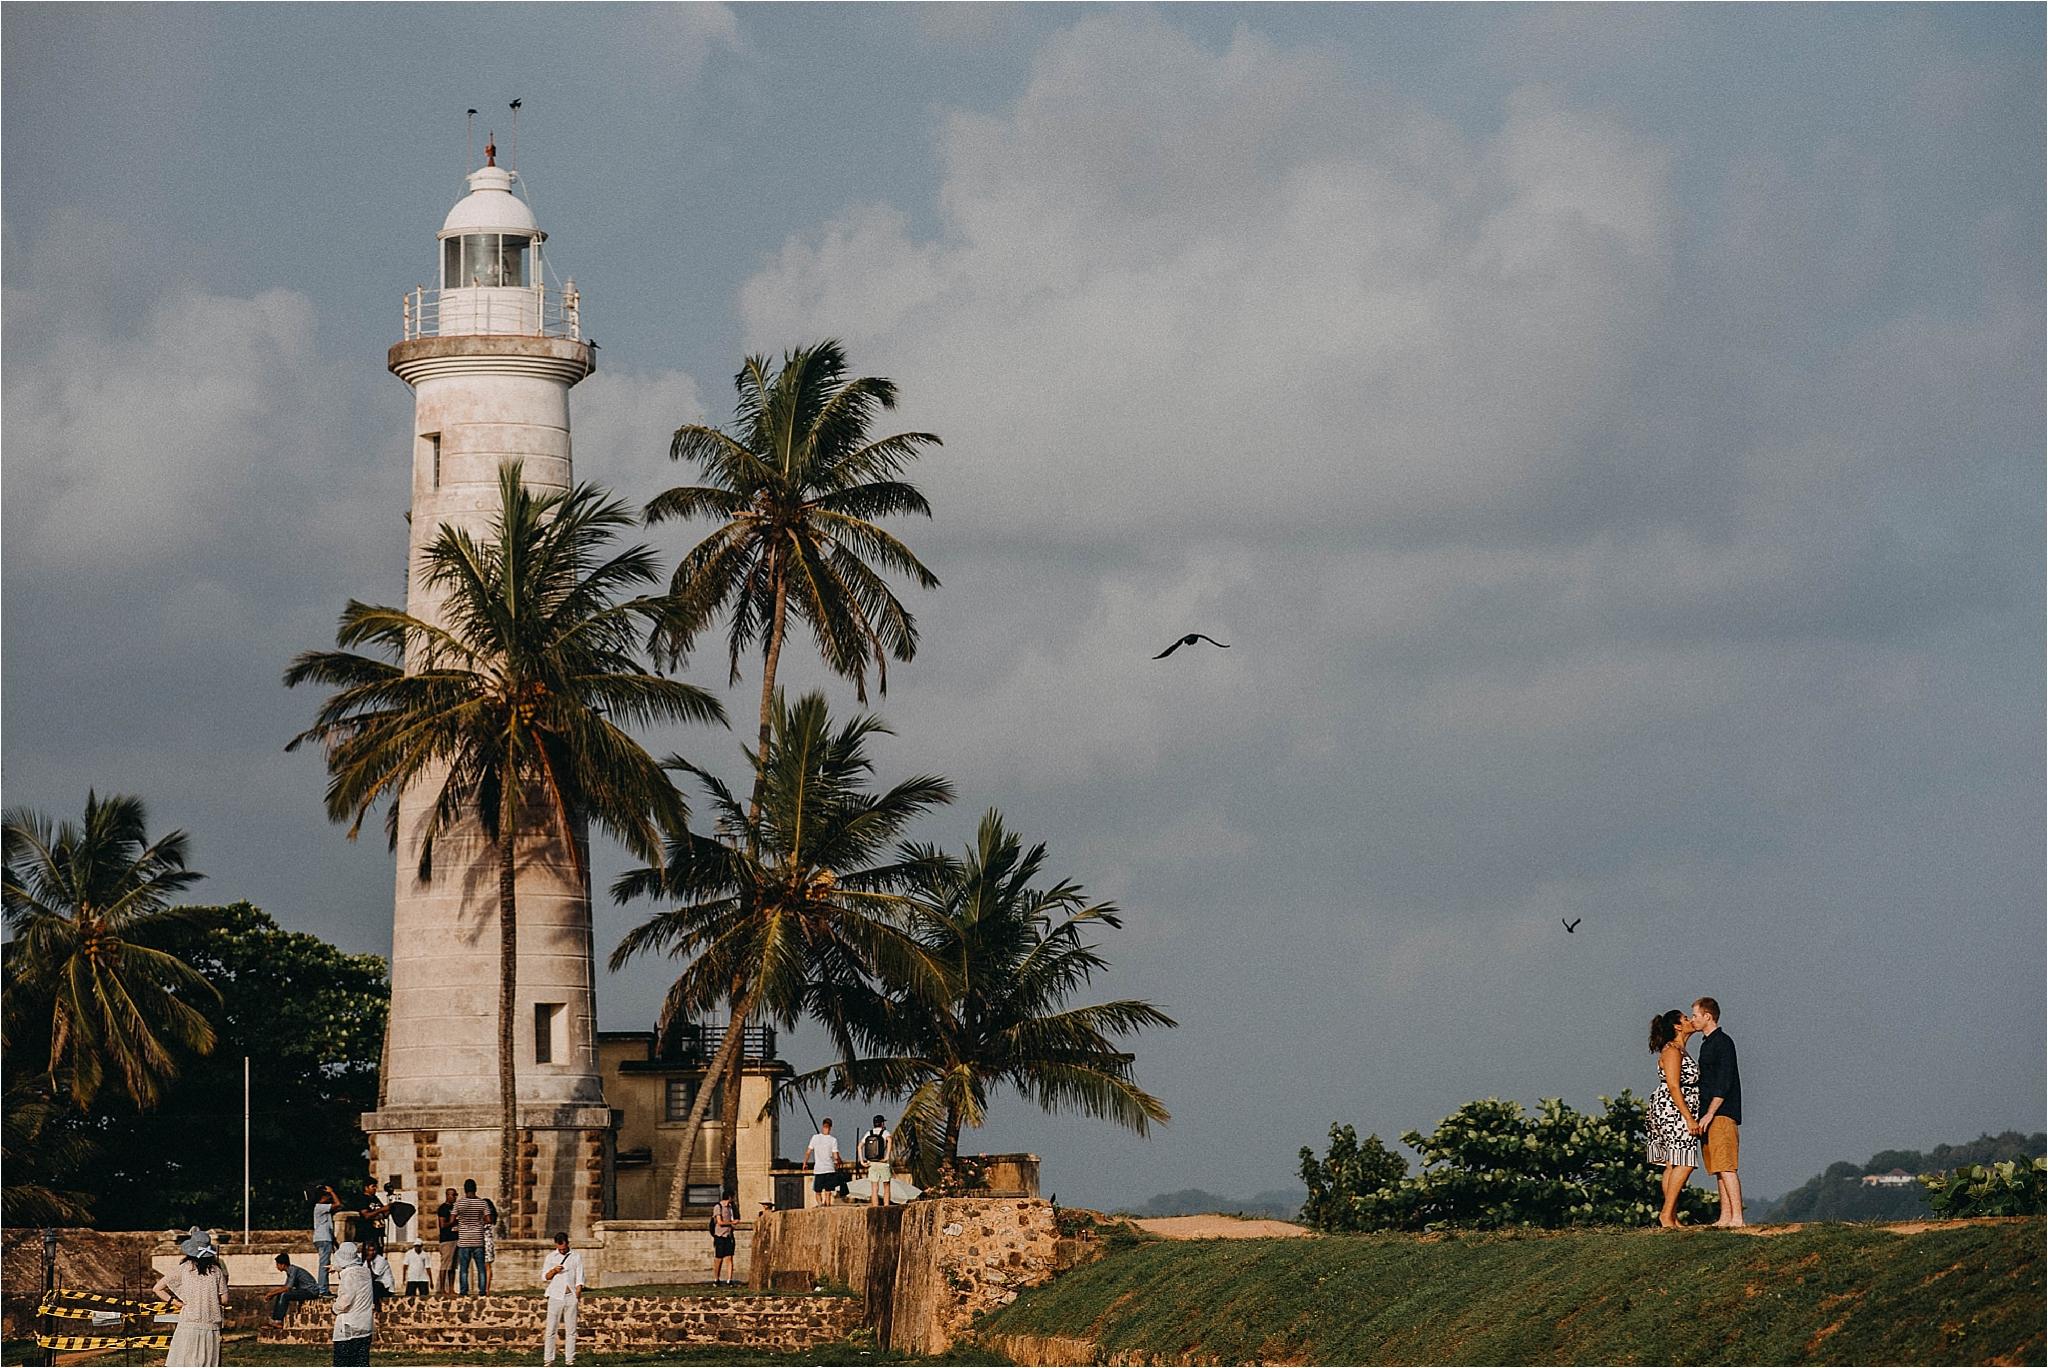 View More: http://barbararahalphotography.pass.us/sambansrilanka